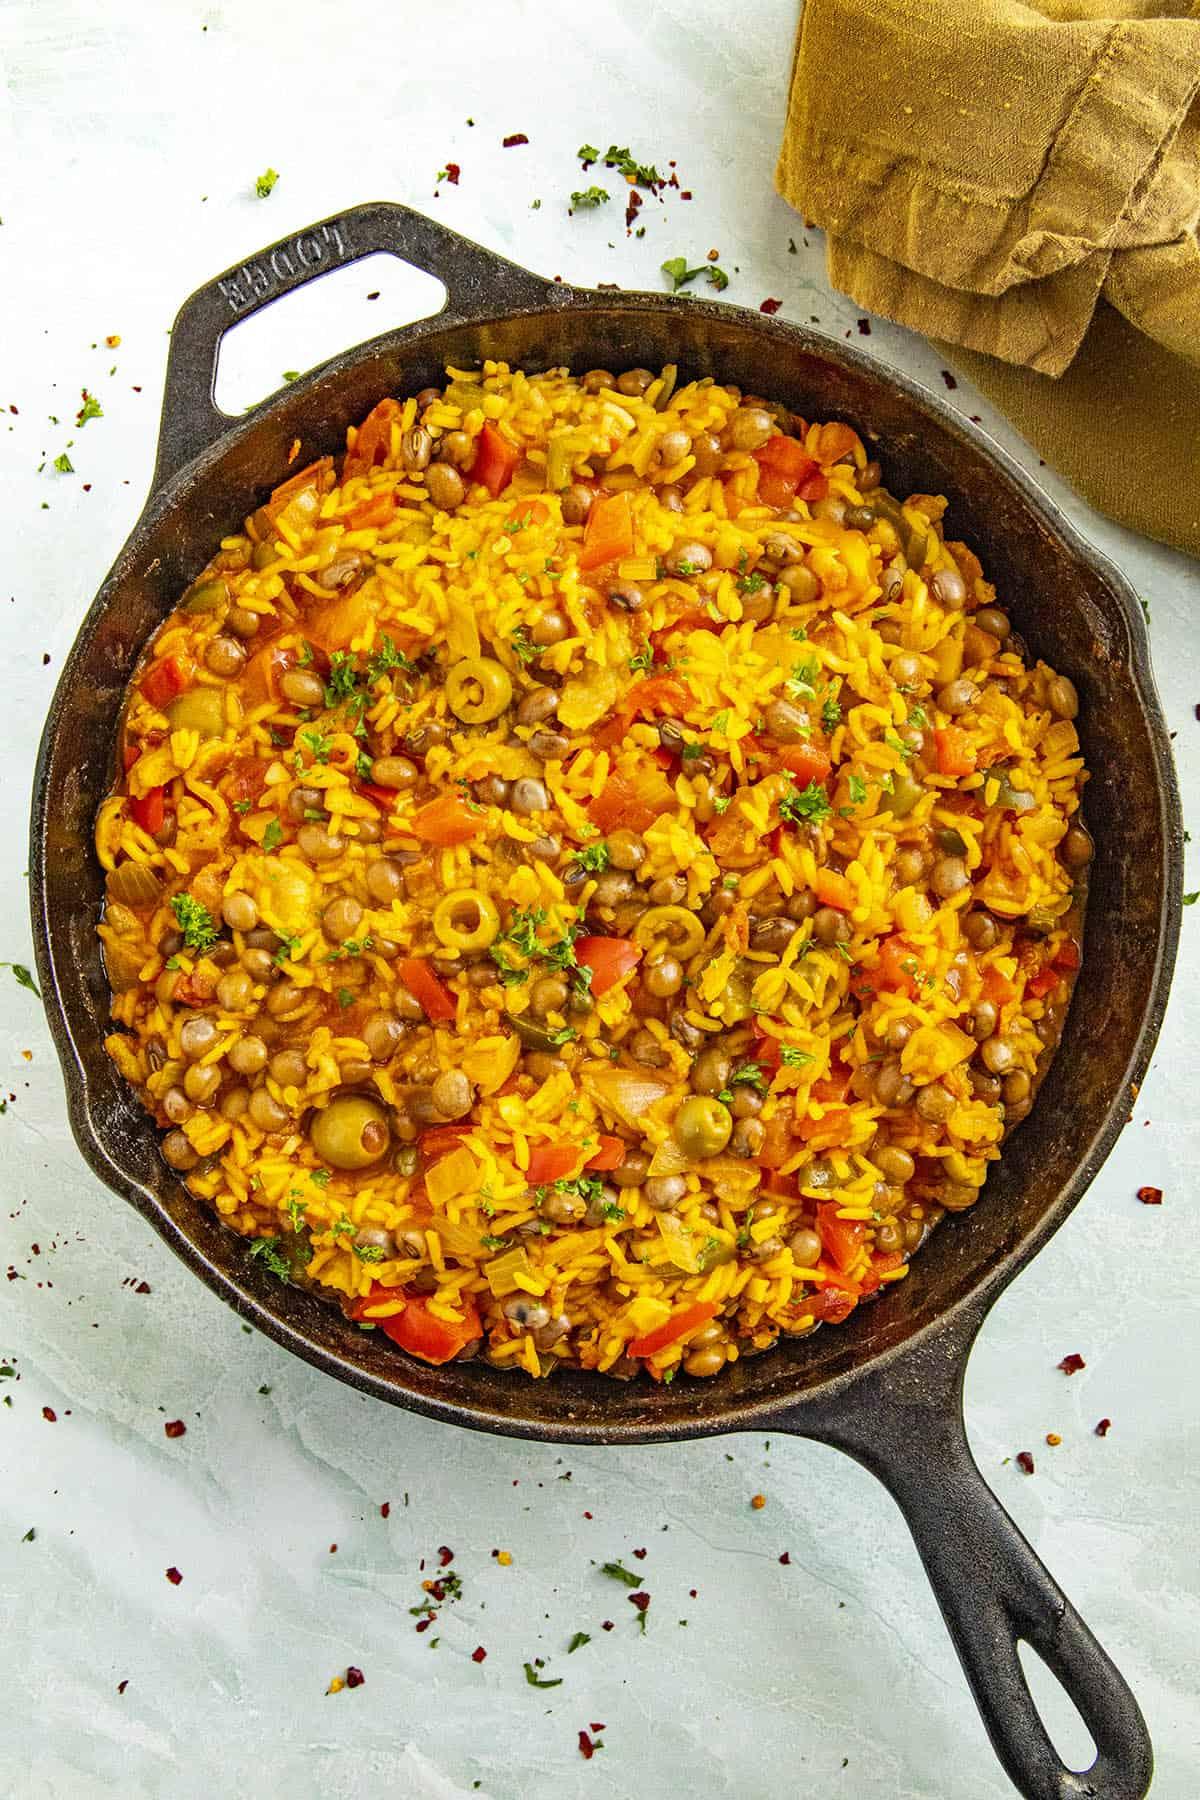 Arroz con Gandules in a hot pan